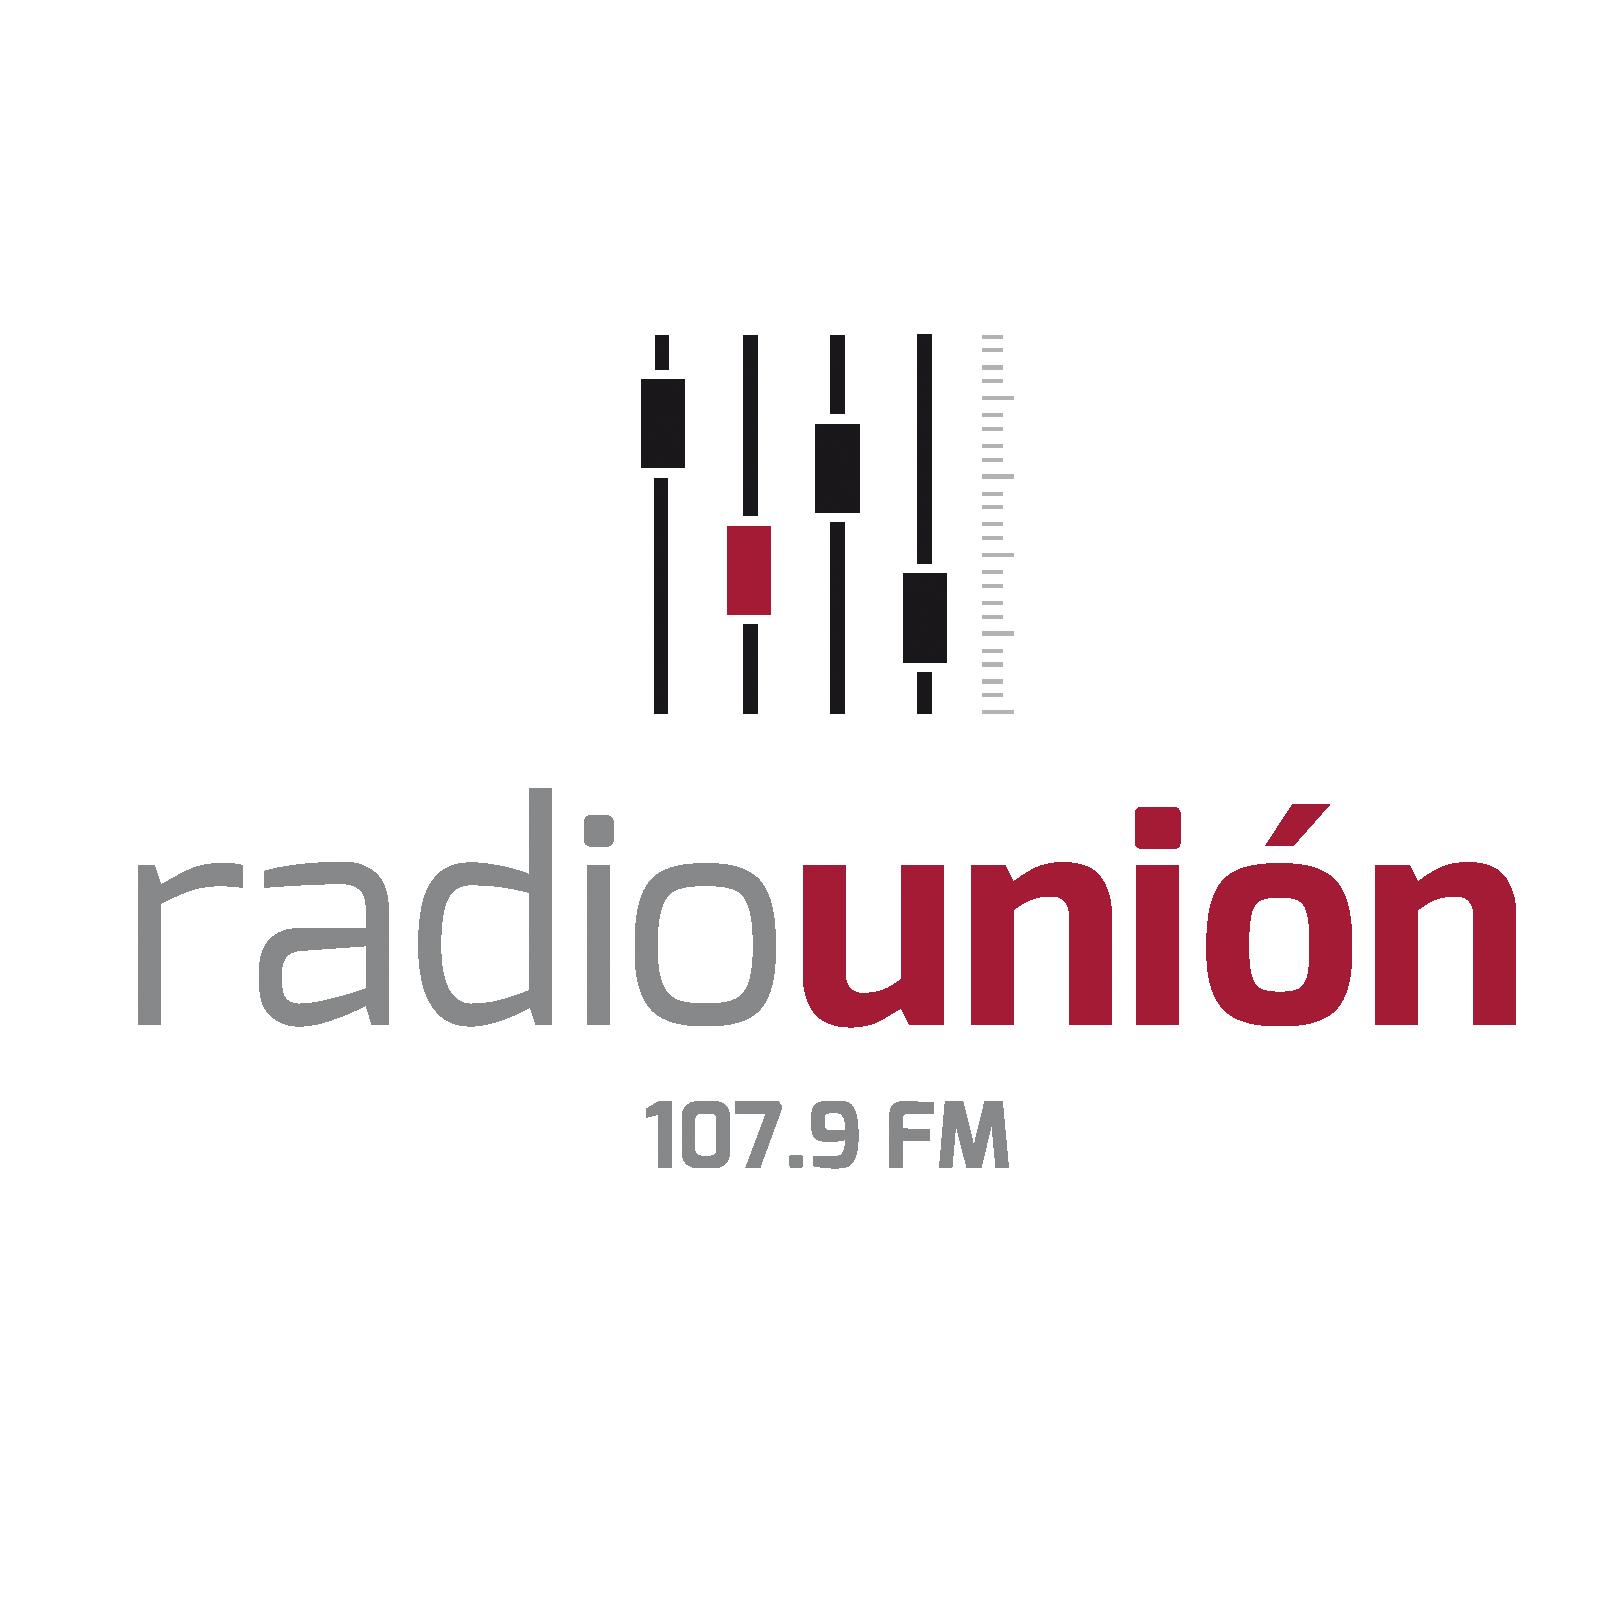 logo radio union